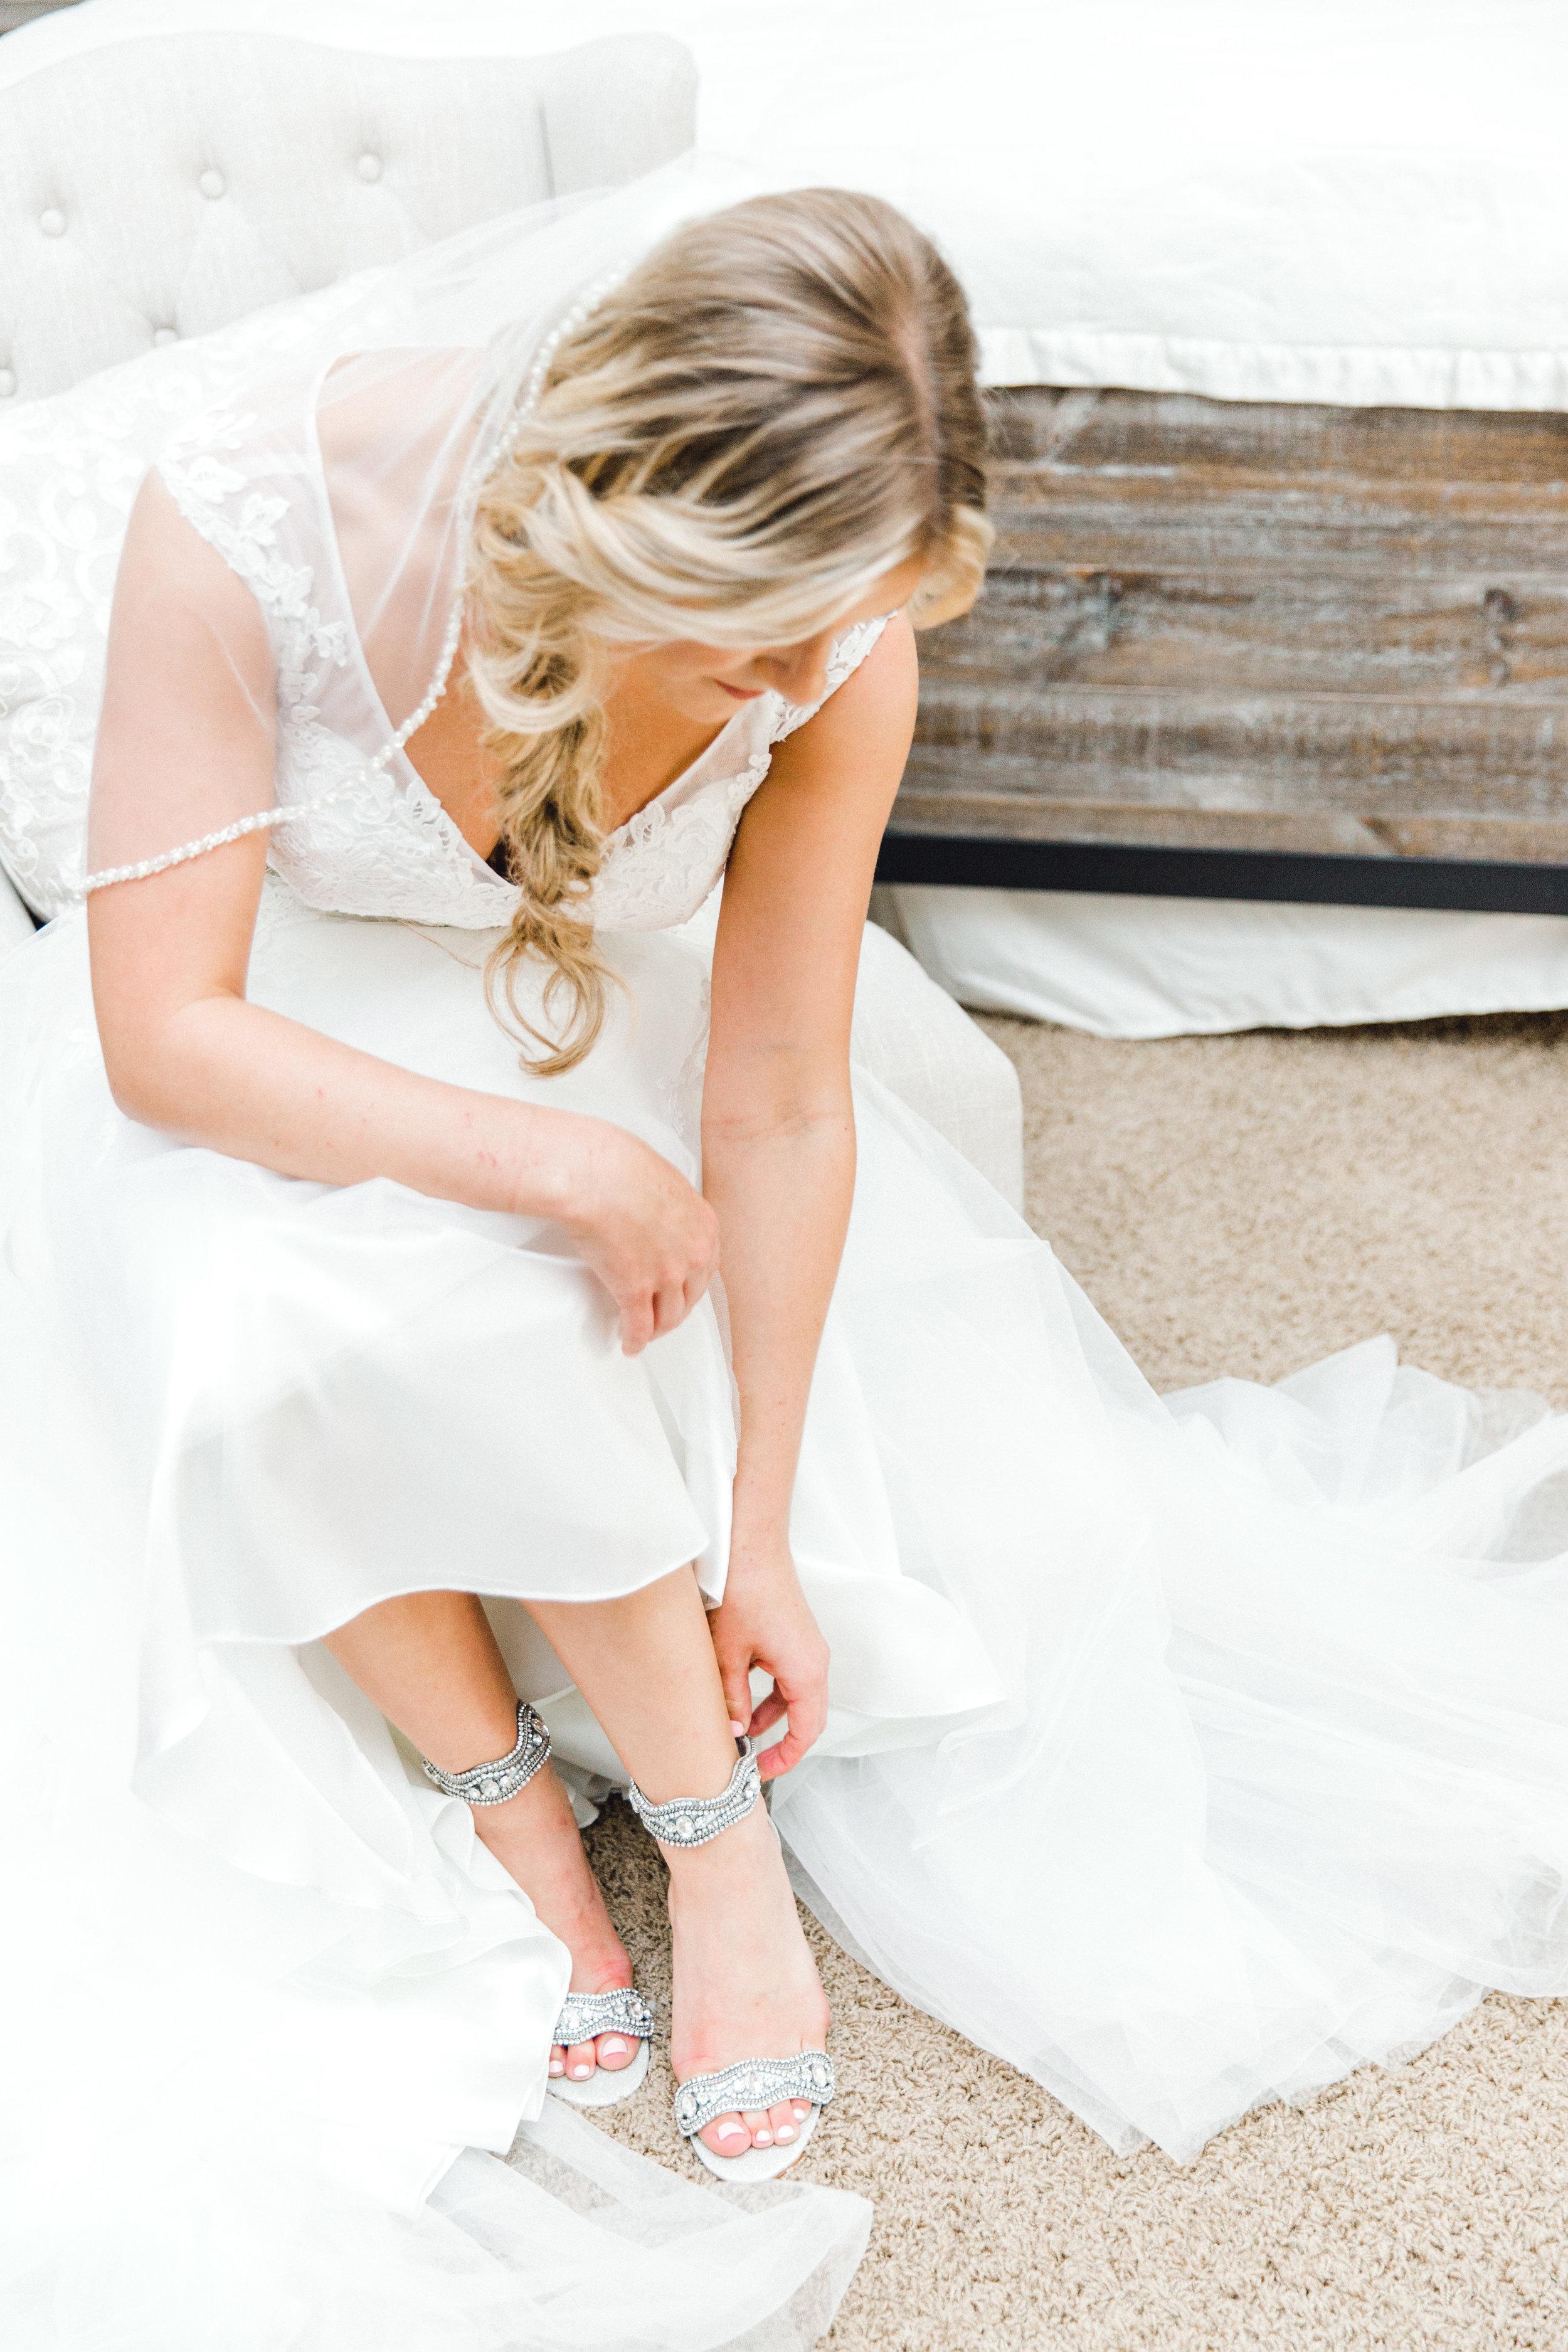 Paige-Mercer-Photography-Florida-Wedding-Photographer-Alyssa&Drew-29.jpg